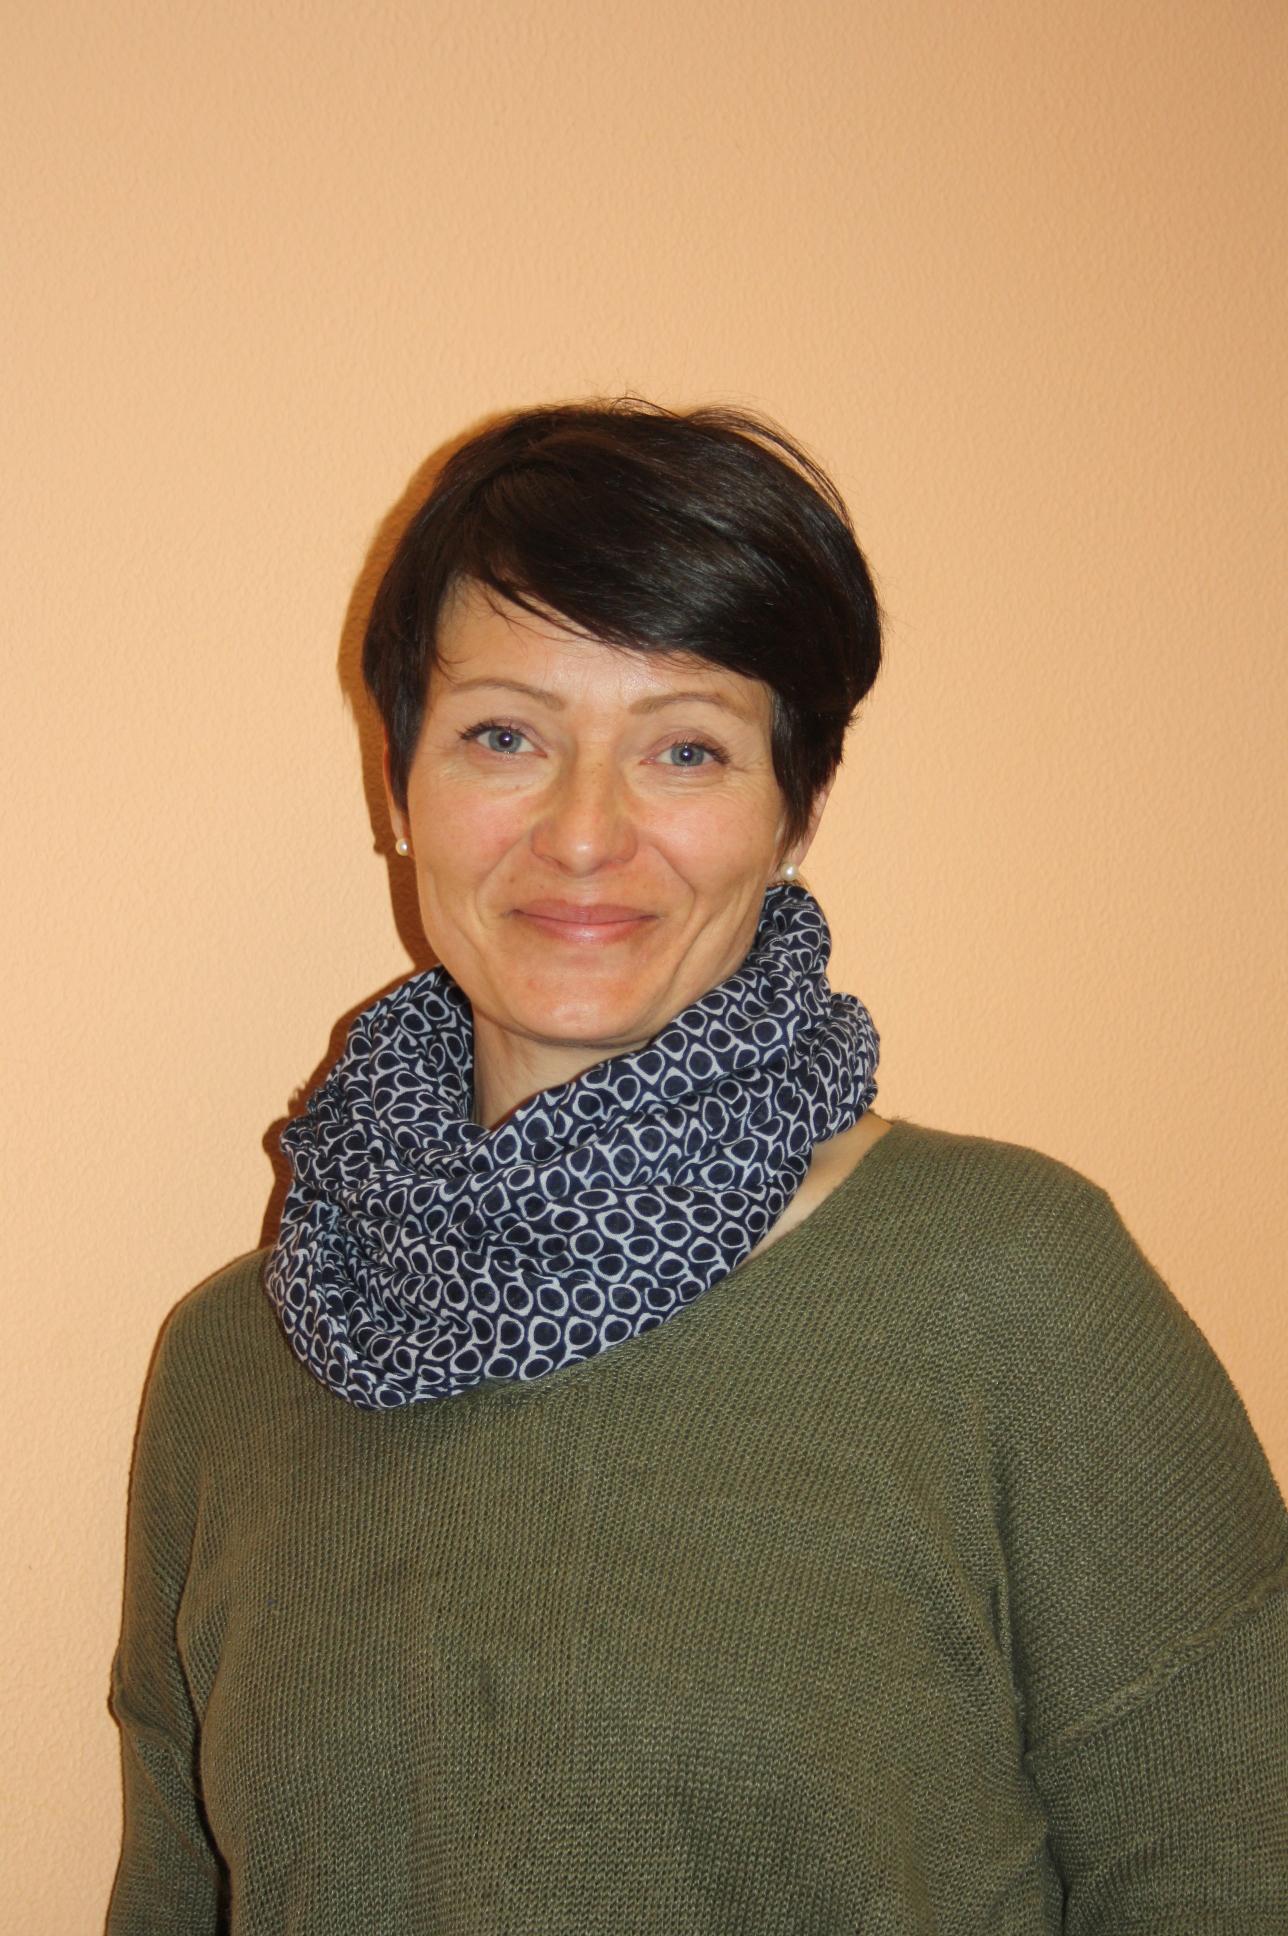 Elisabeth Aigner